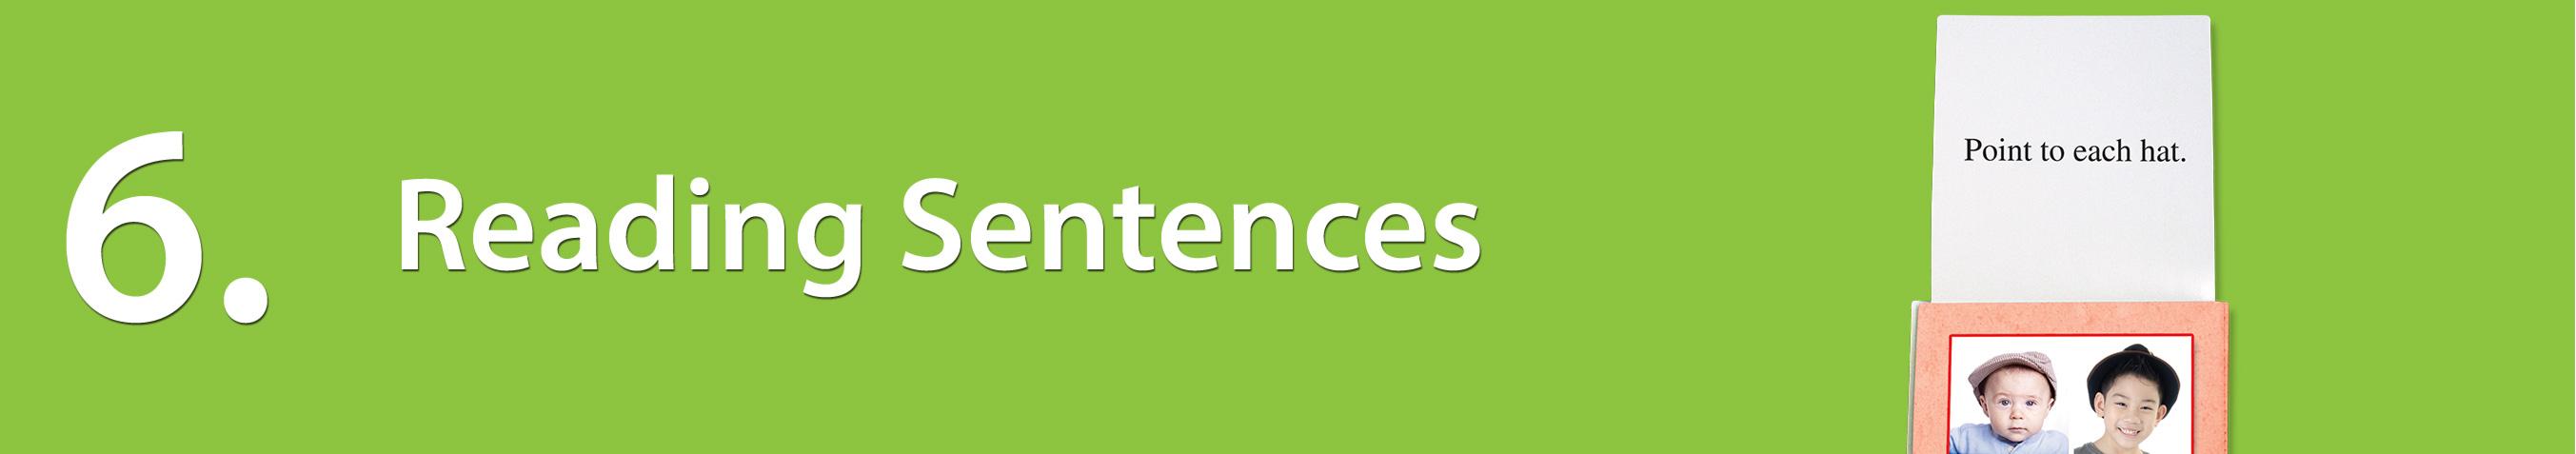 Milestone 6: Reading Sentences